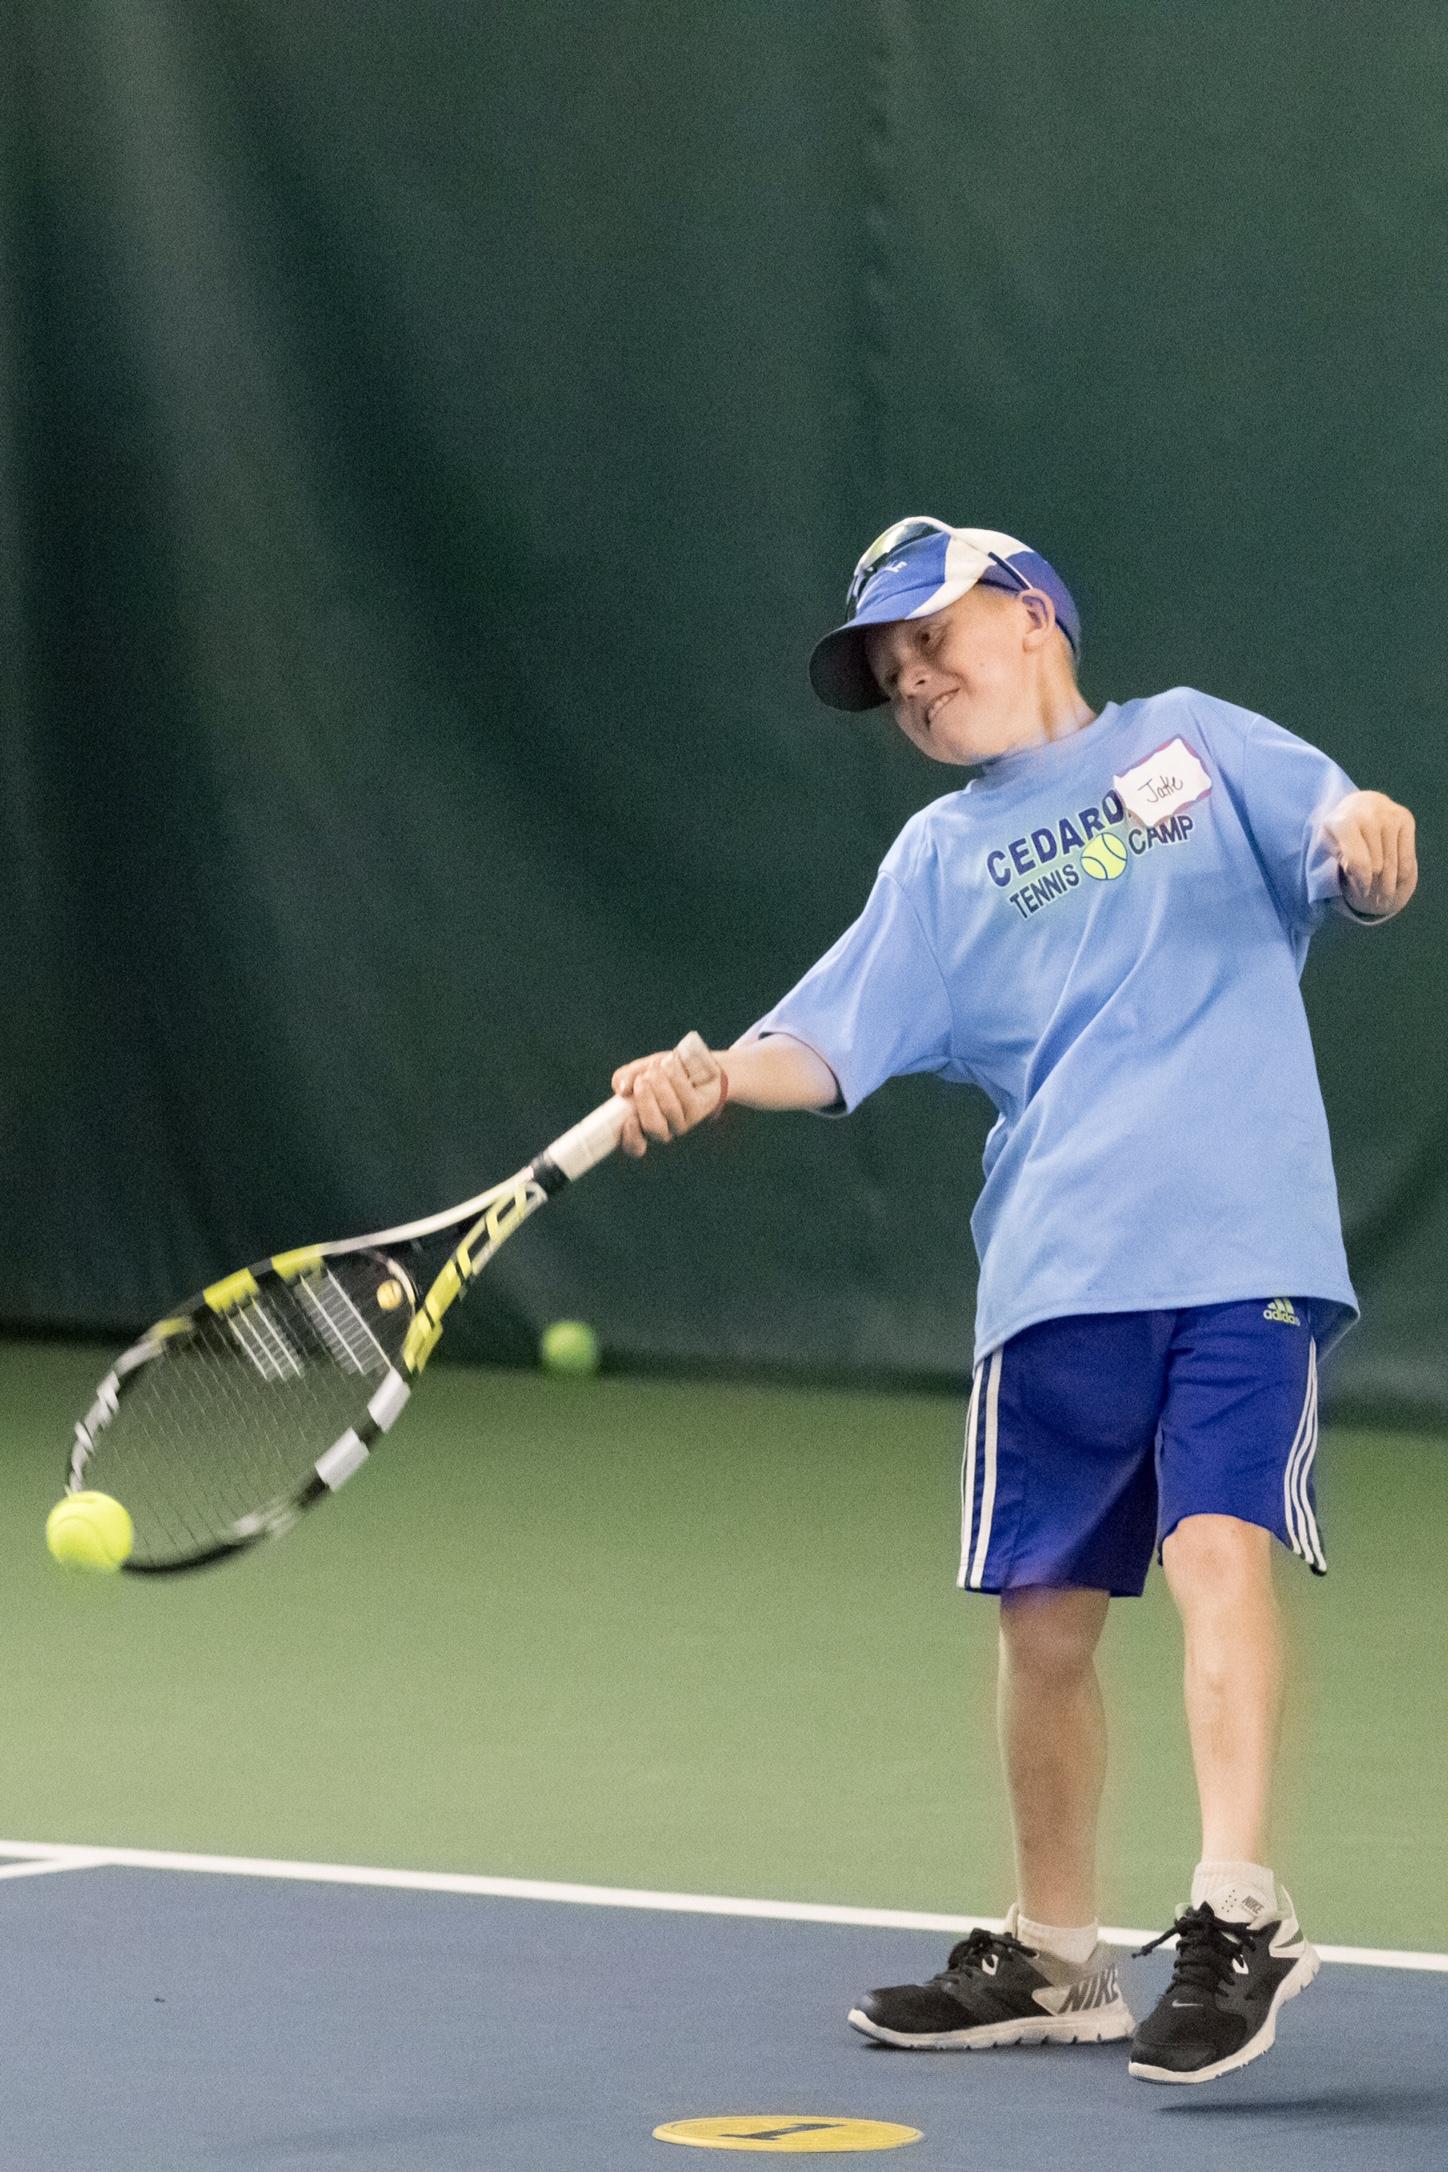 Cedardale Health & Fitness Tennis